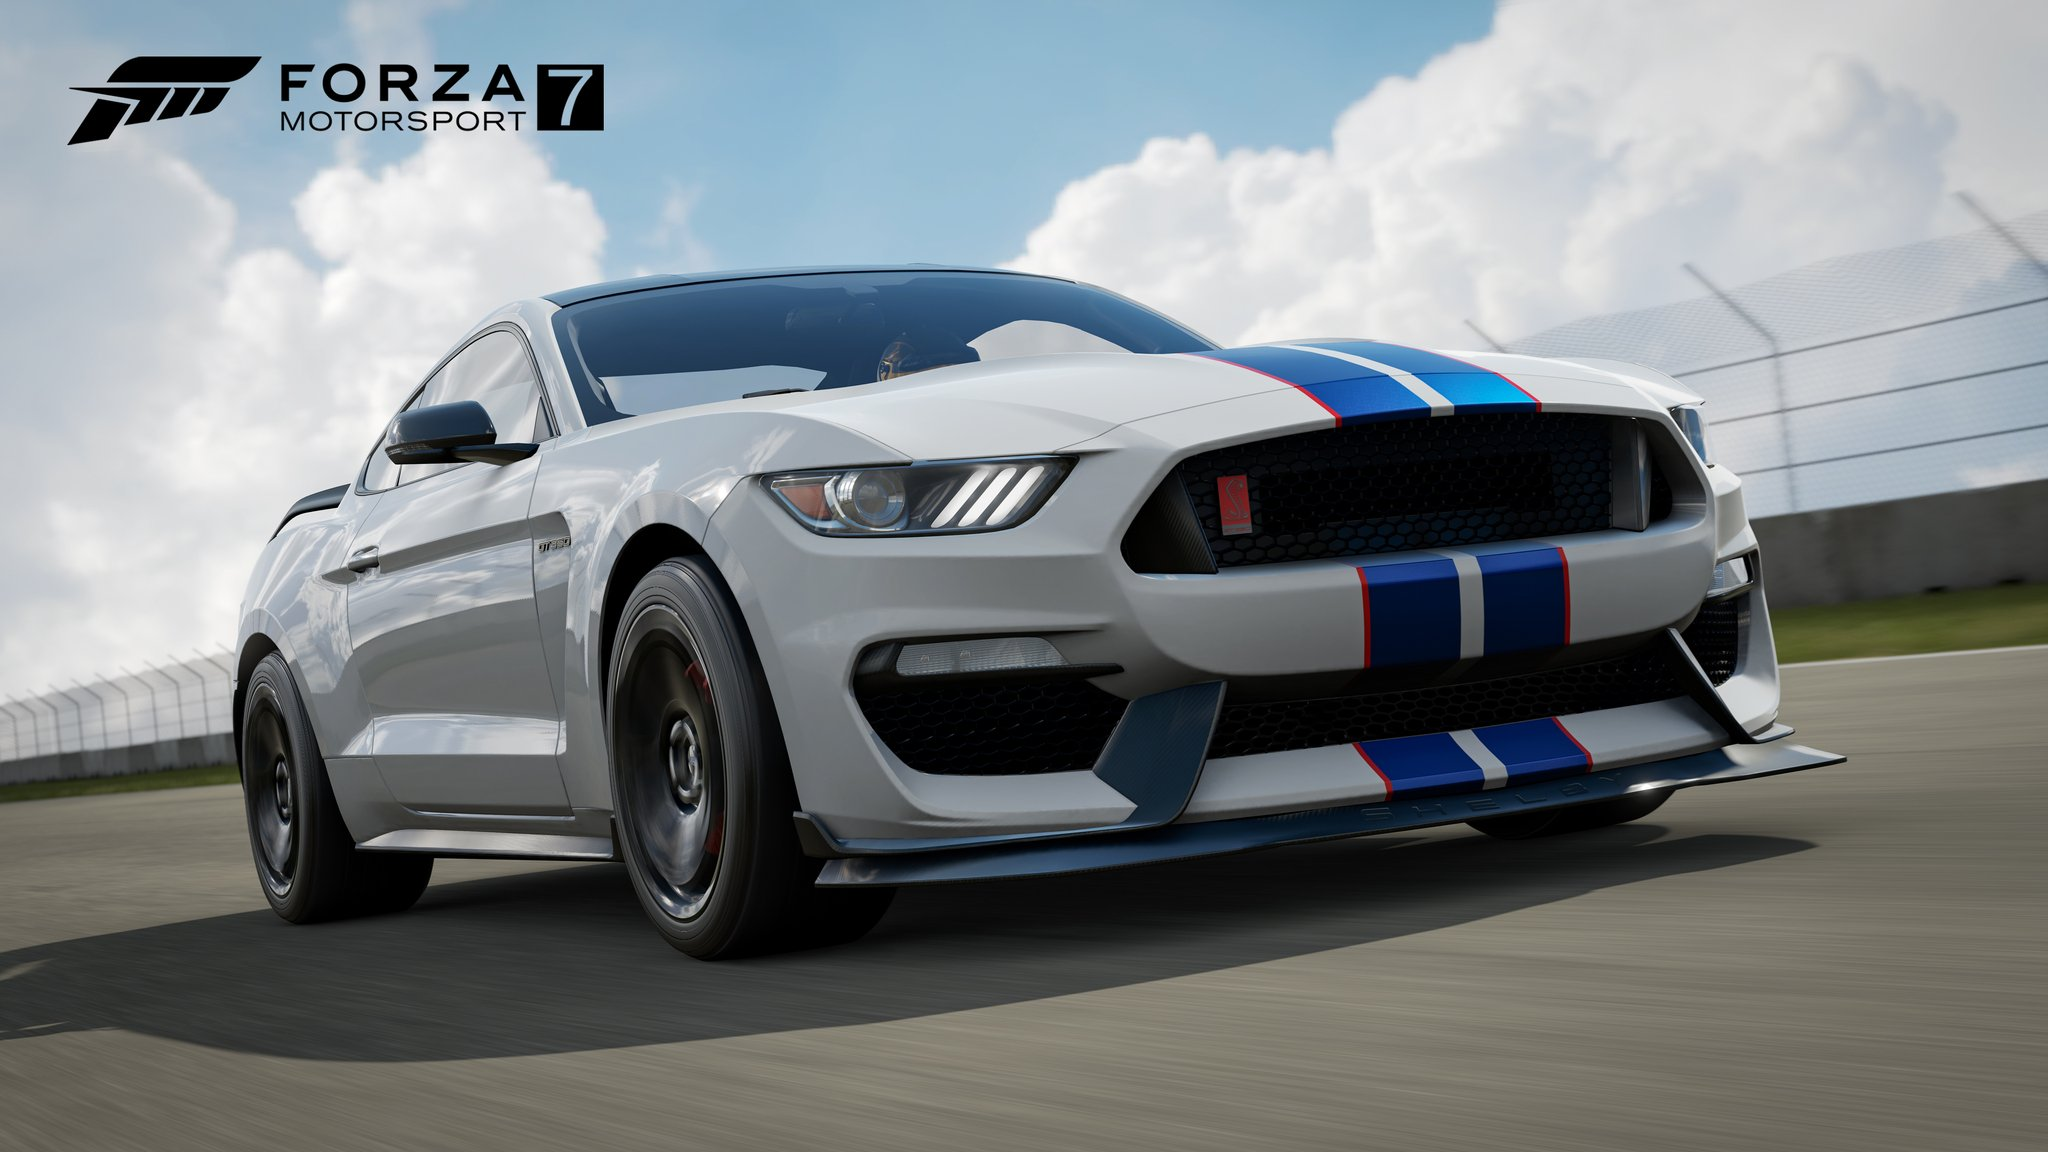 Forza 7 Car Reveal 4.jpg